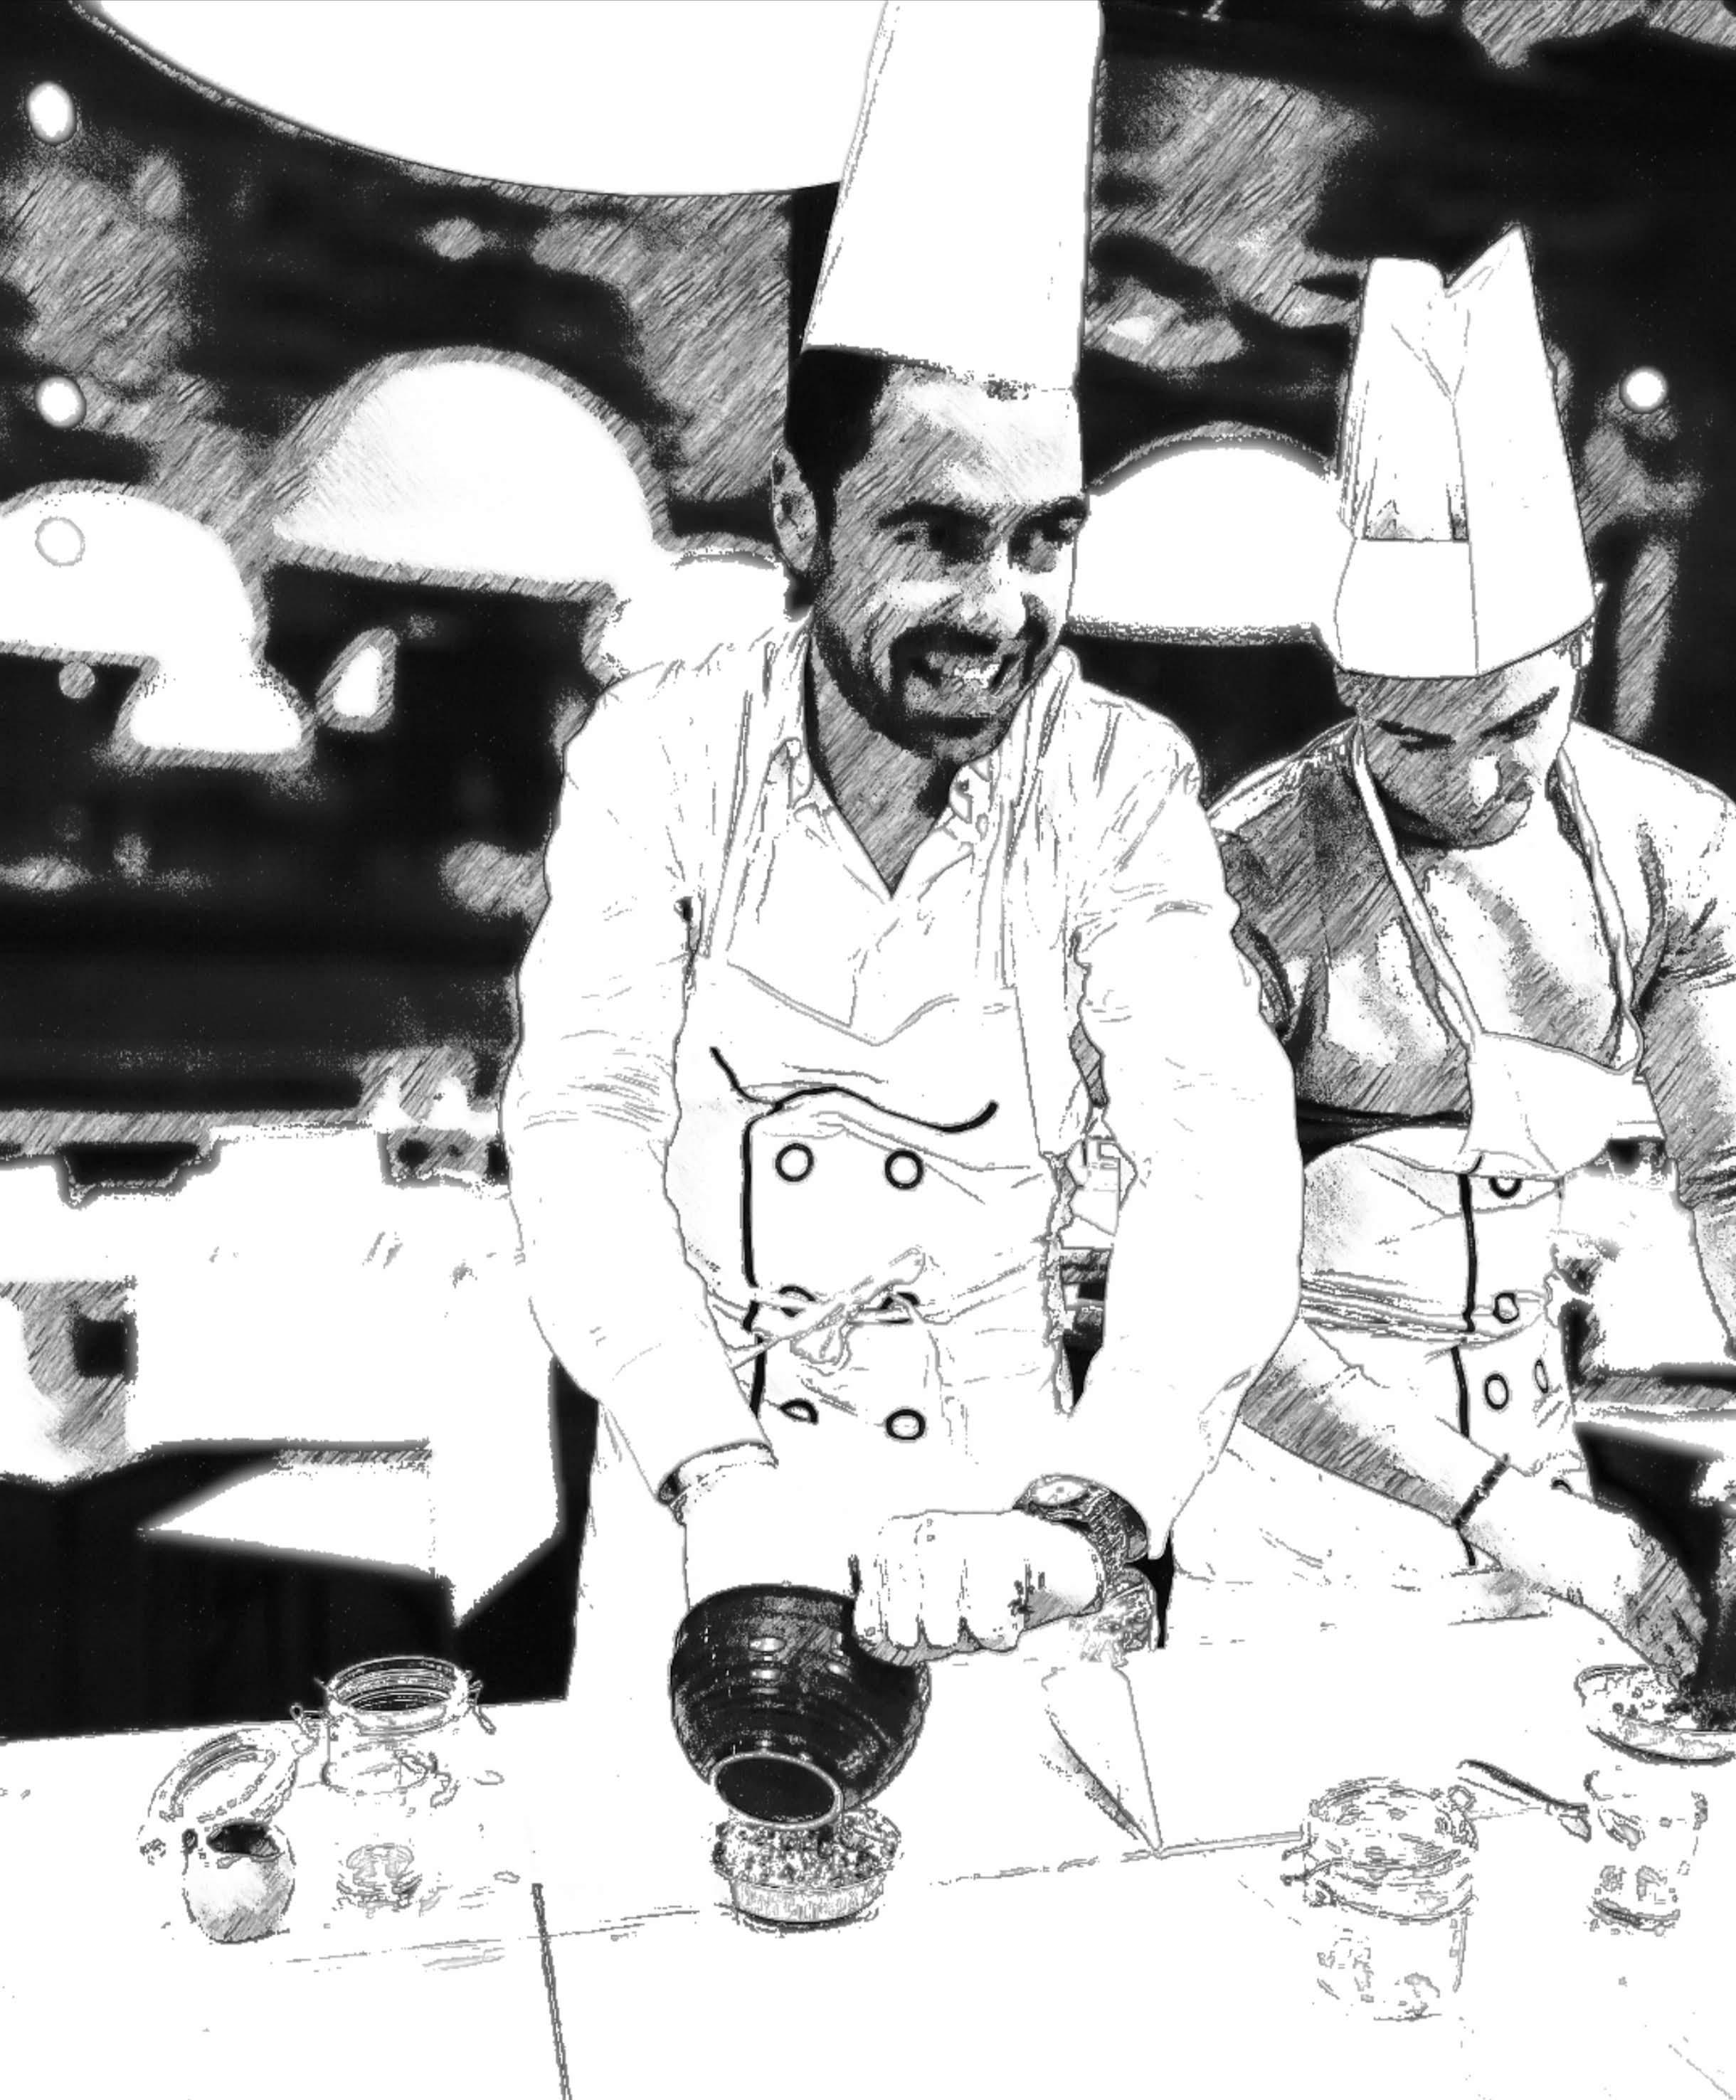 team building cook eat leard Loro piana a Grani&Braci